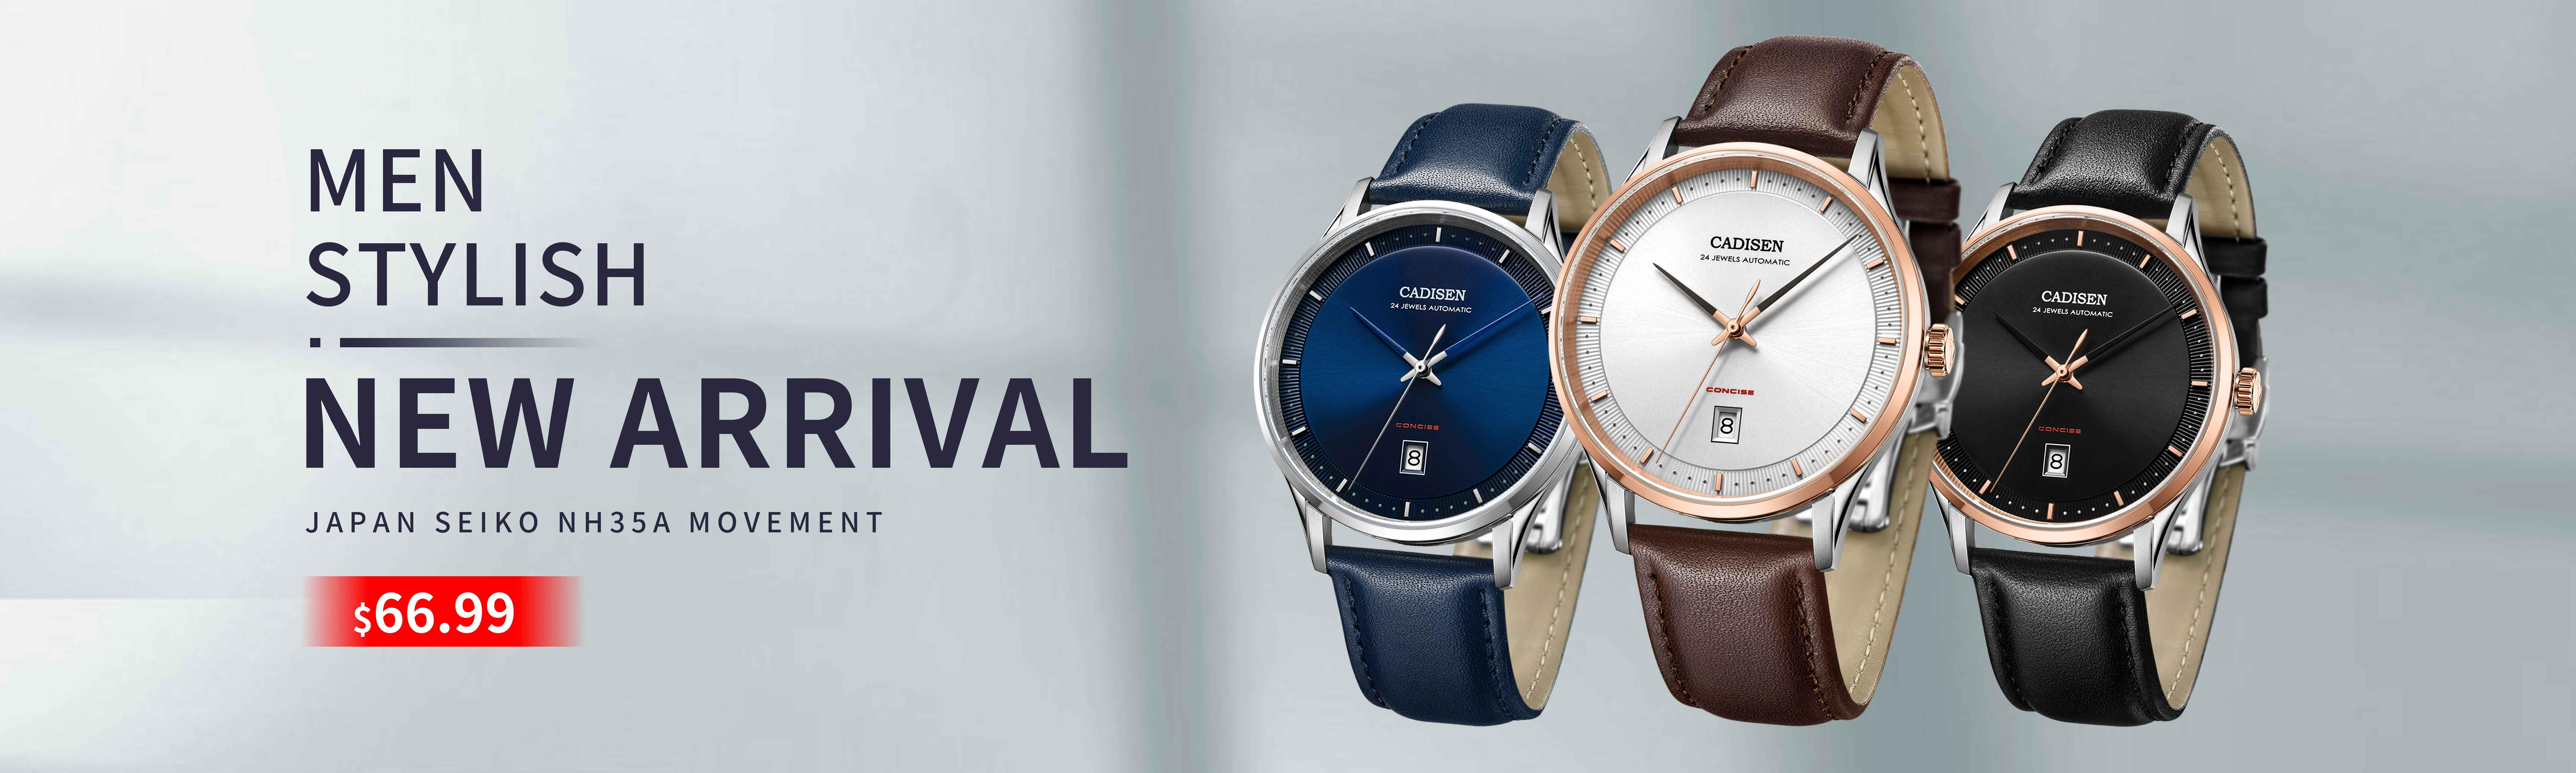 Hd9c2e552e6ee401997f31464f6bc7567T CADISEN Top Mens Watches Top Brand Luxury Automatic Mechanical Watch Men Full Steel Business Waterproof Fashion Sport Watches